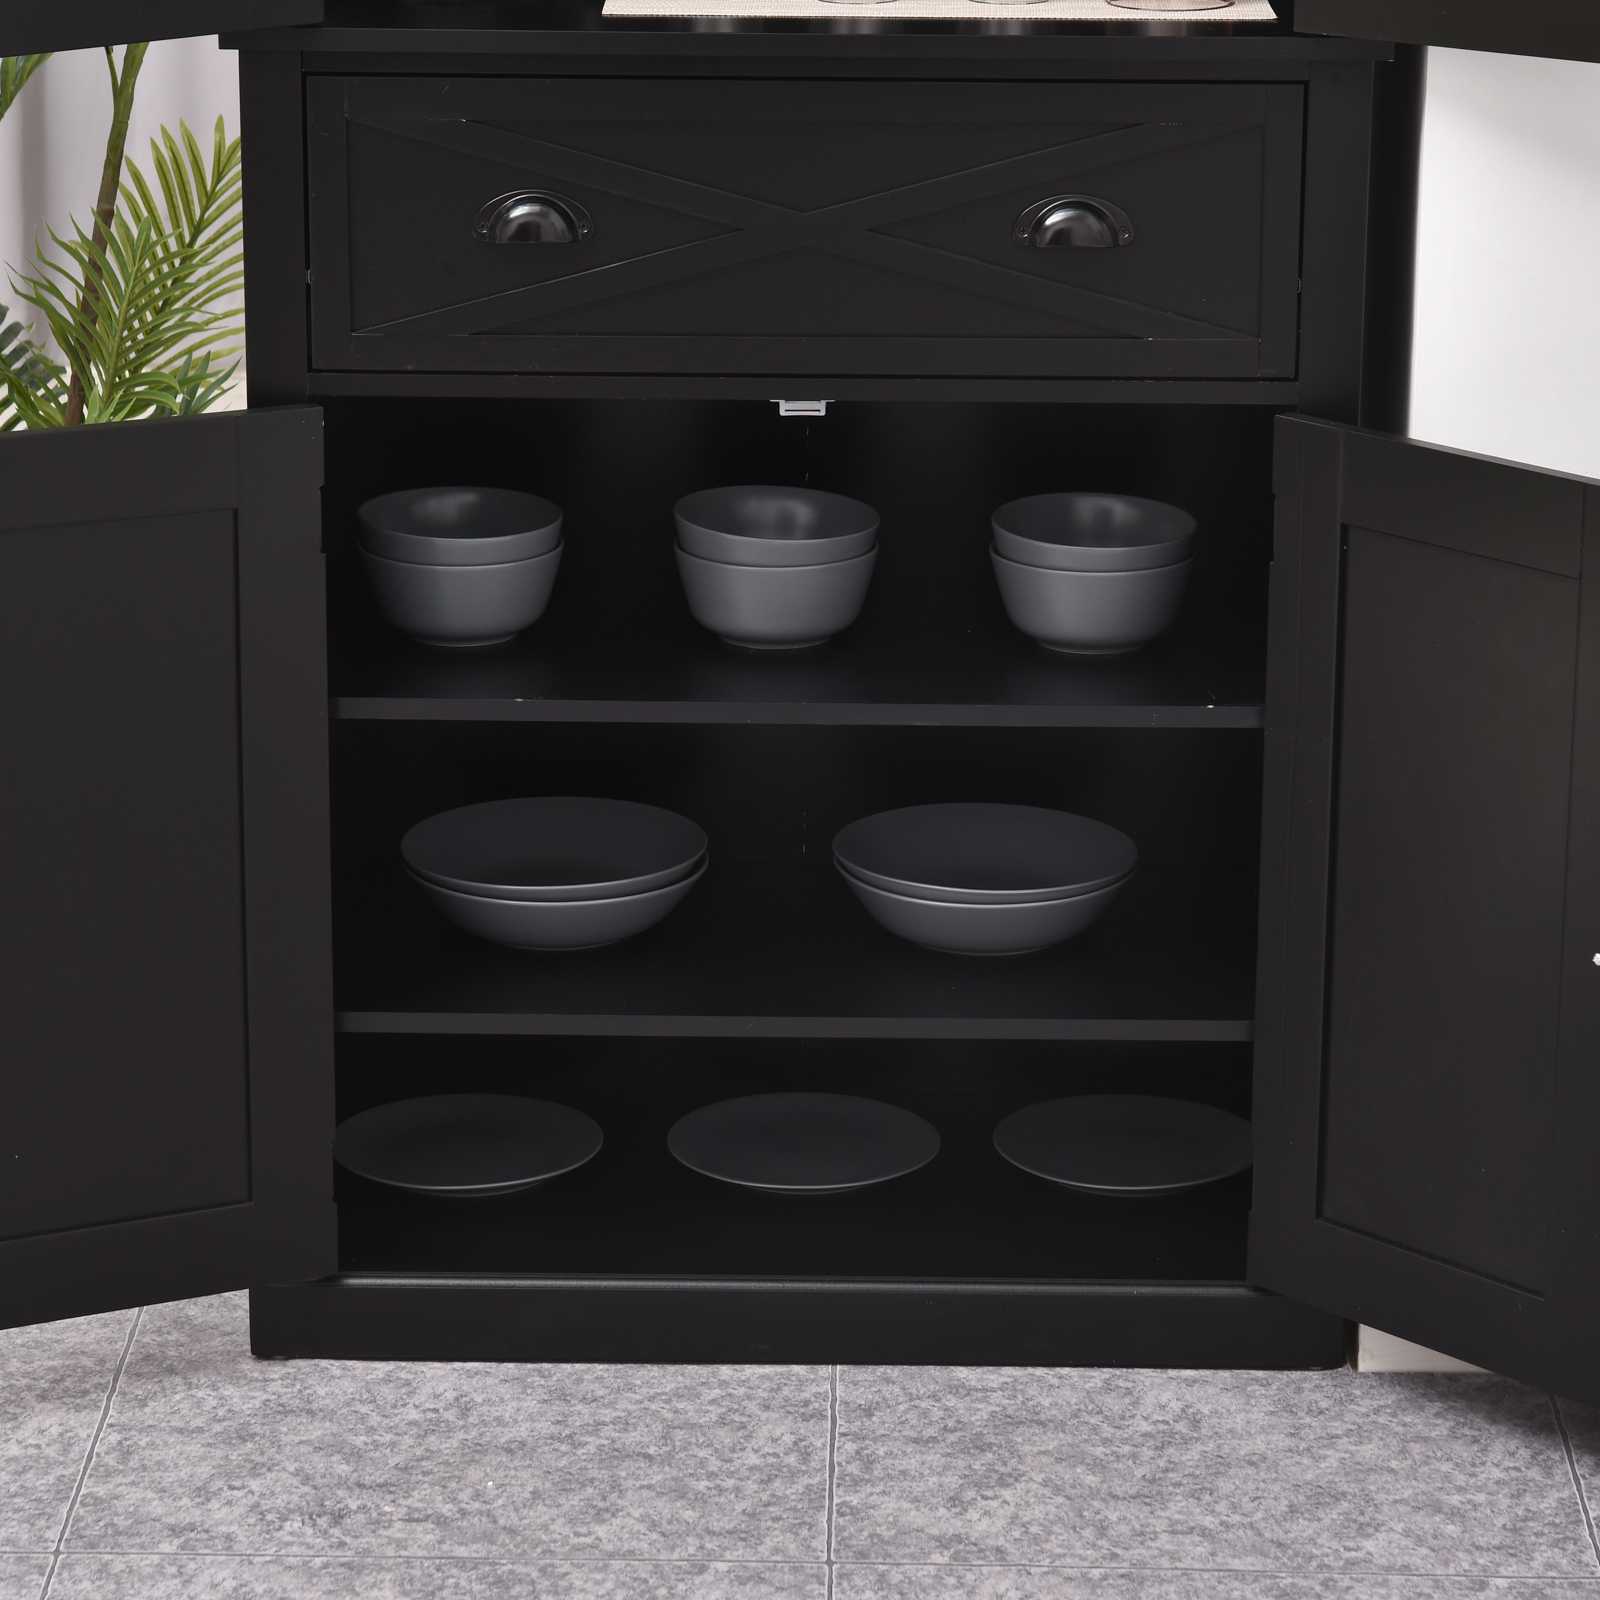 5ft Tall Wood Kitchen Storage Cabinet w/ Adjustable ...